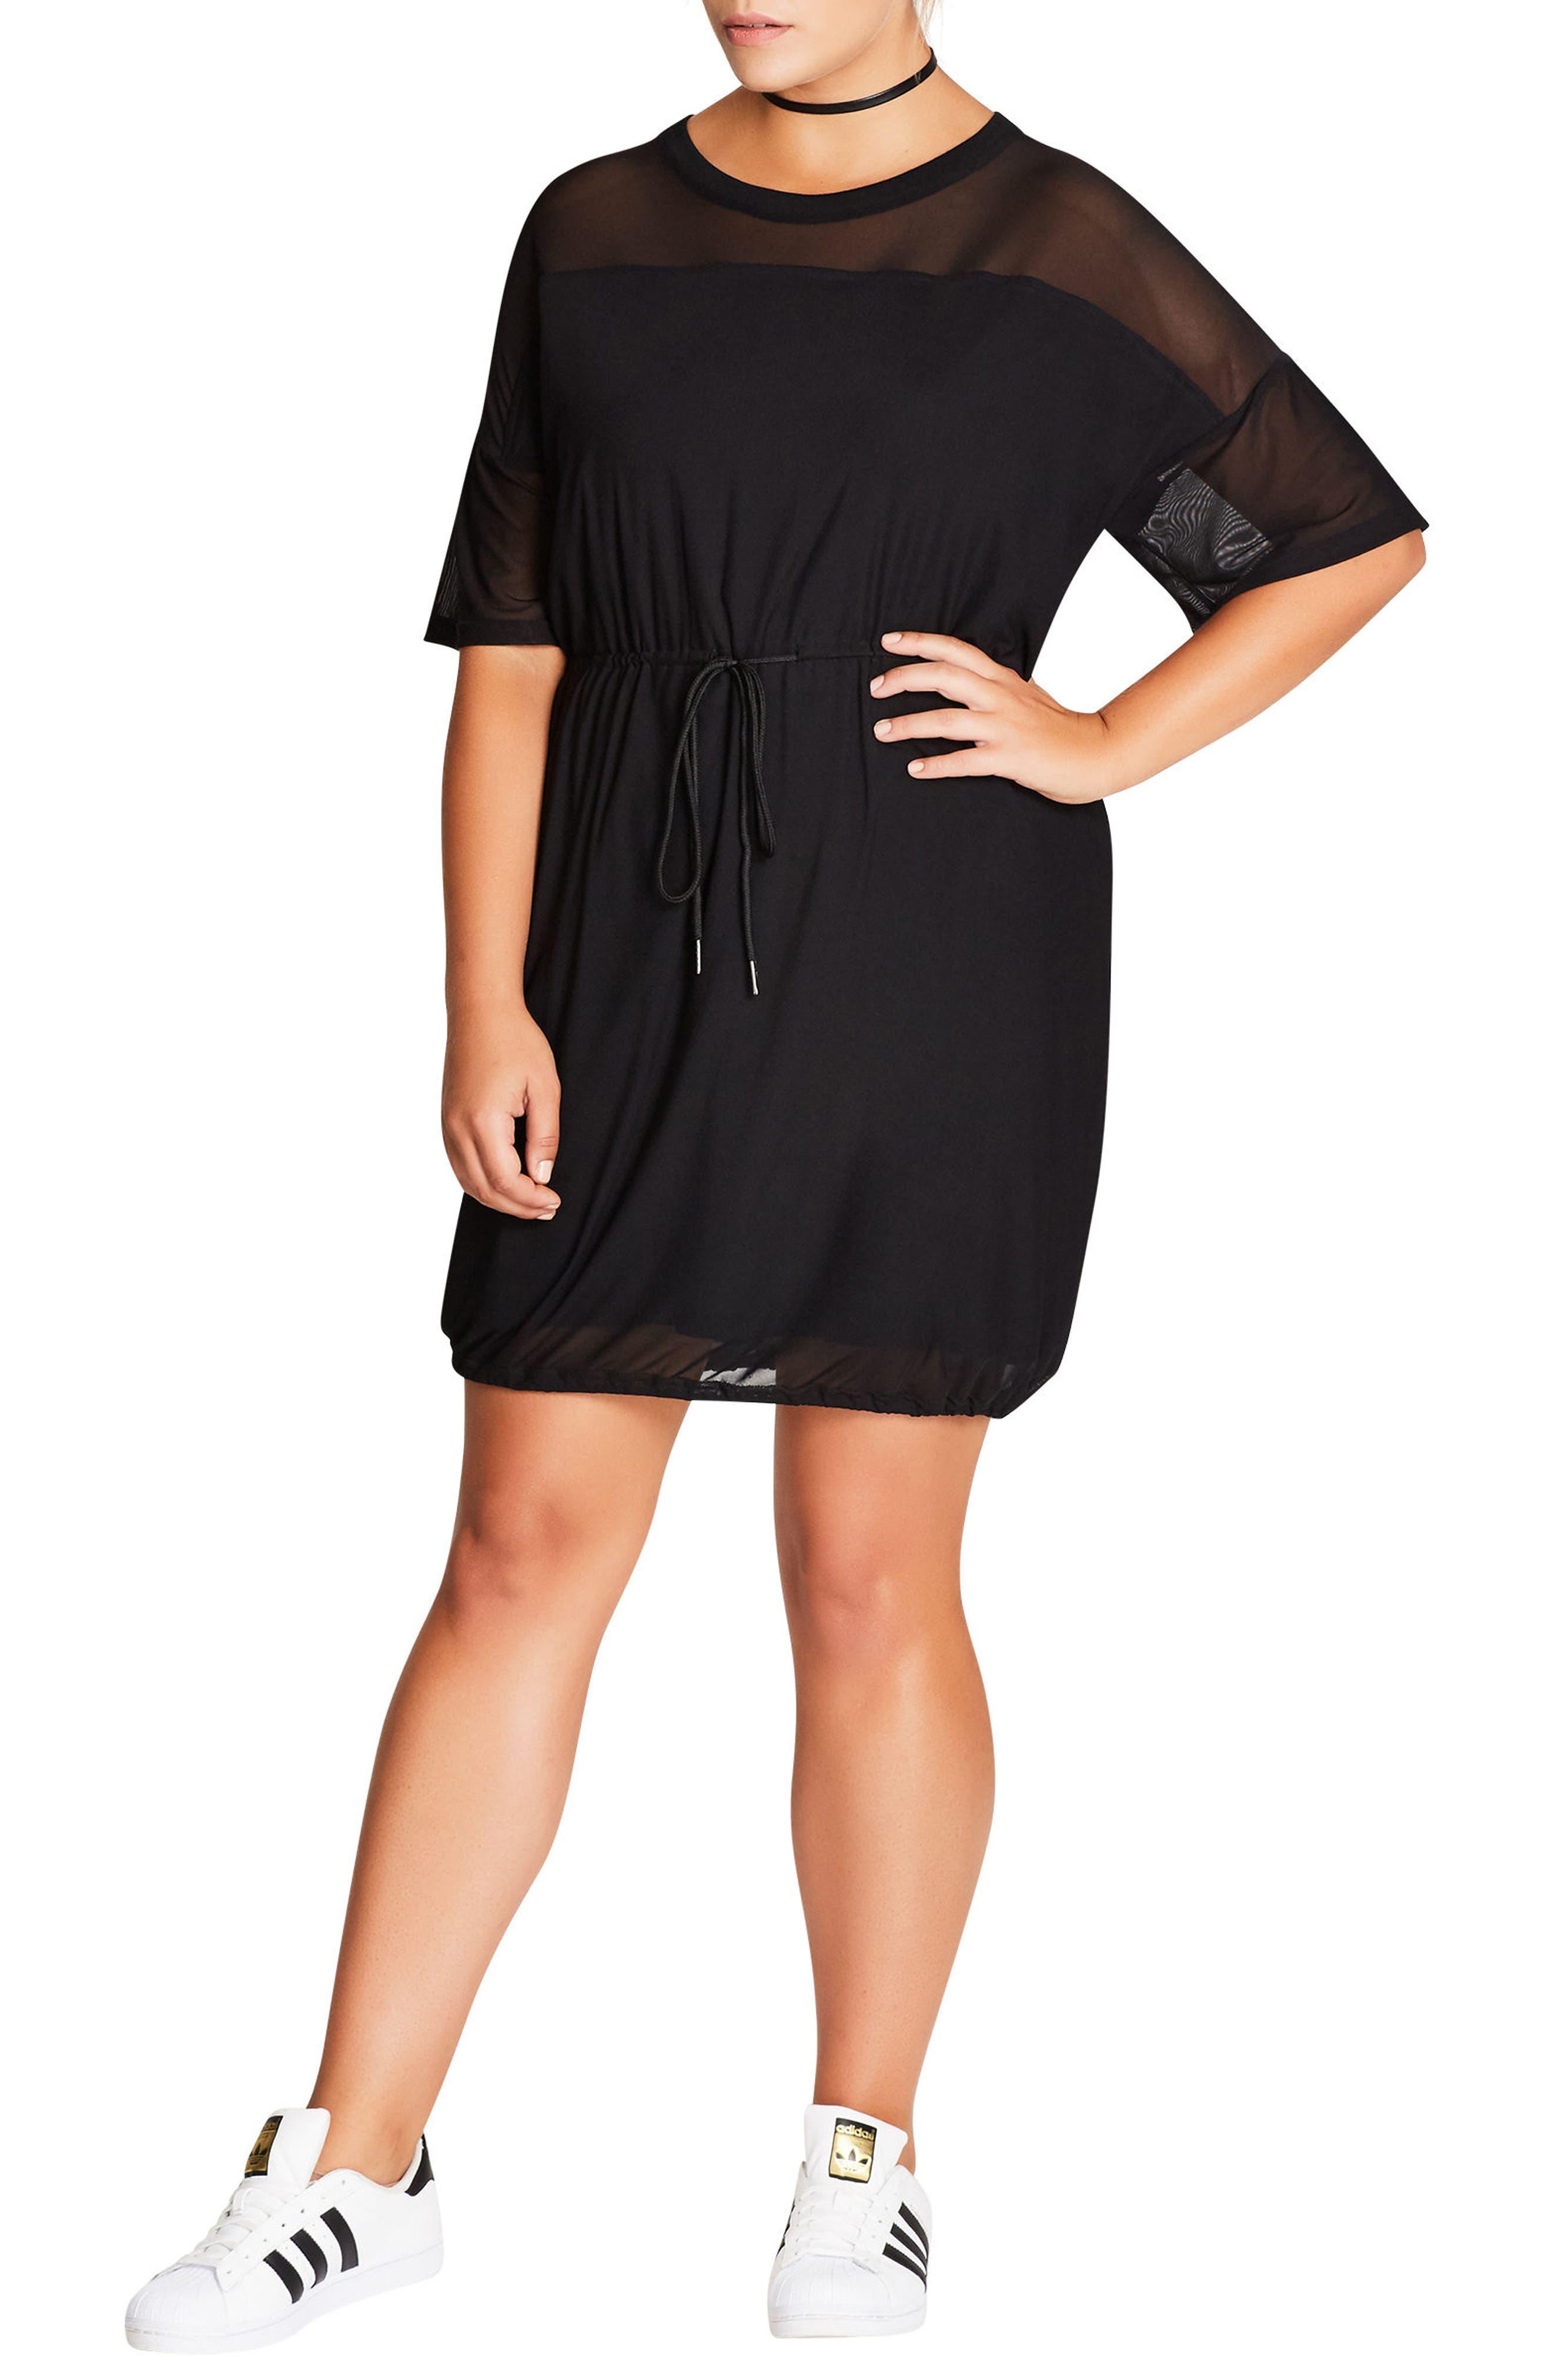 Main Image - City Chic Sports One Tunic (Plus Size)